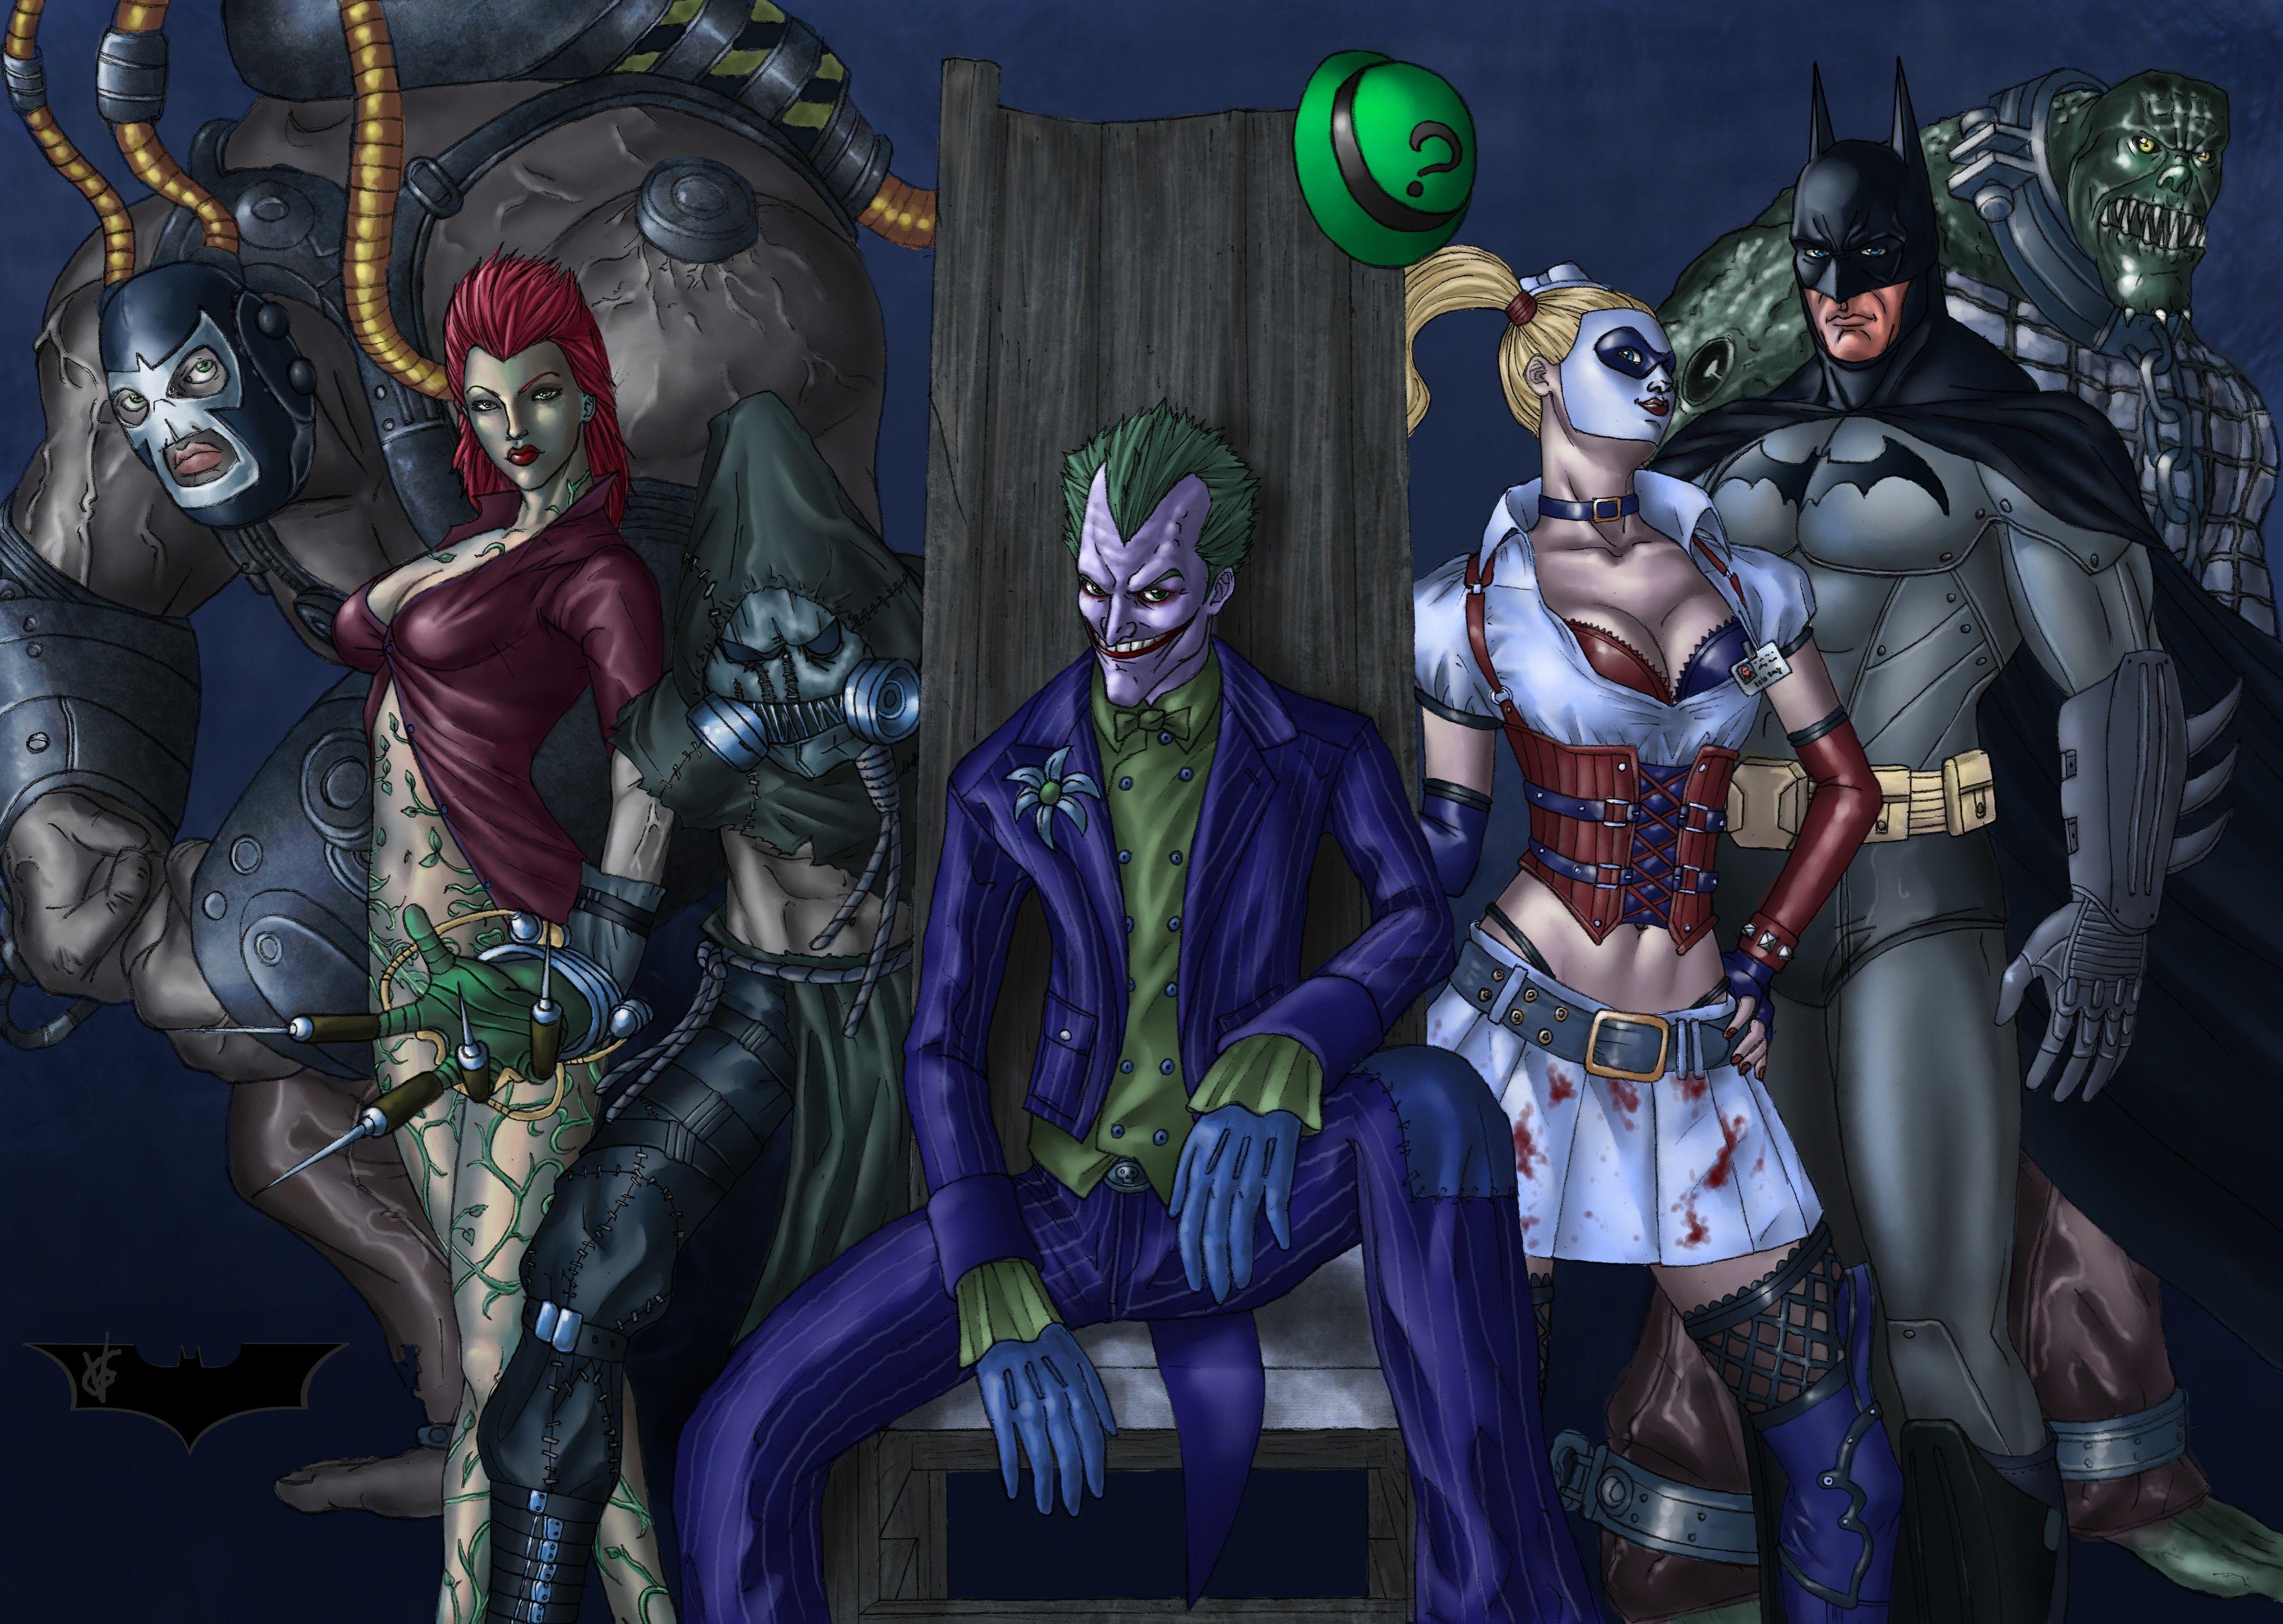 Batman Posters Batman And Joker Arkham Asylum Game Poster Therufus Com Batman Arkham Asylum Batman Arkham Joker Comic